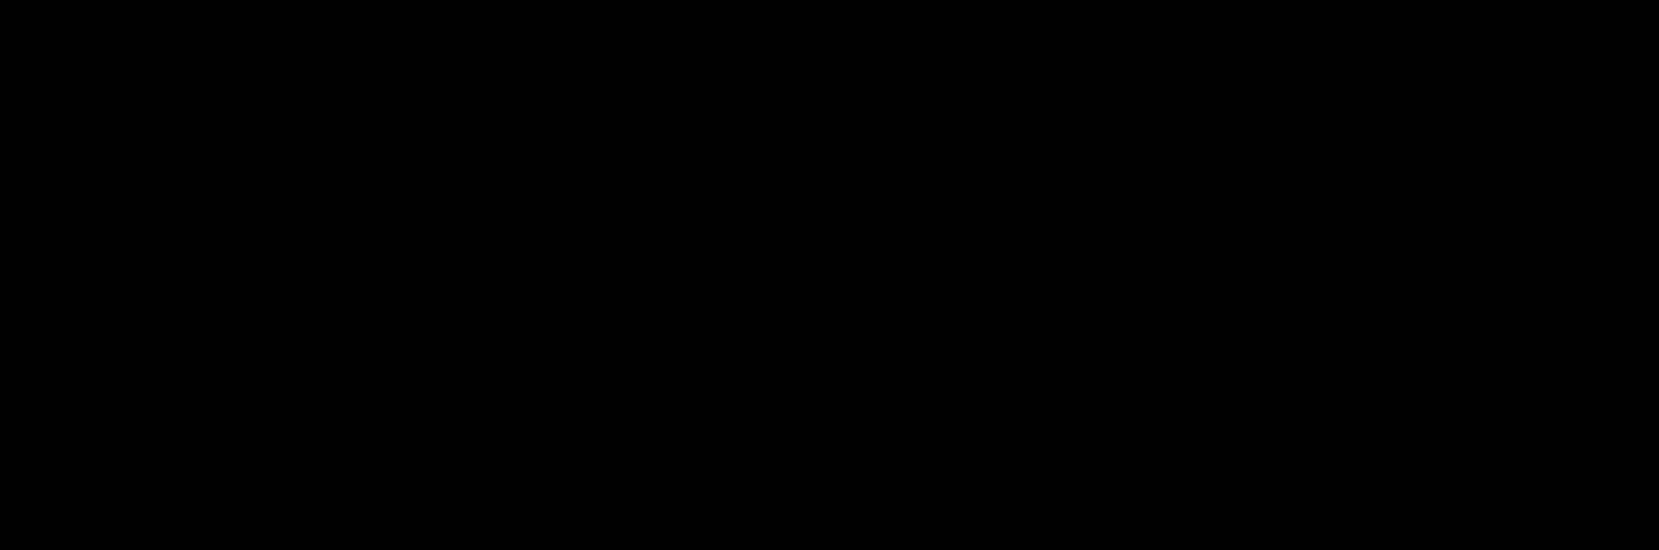 fondo_negro